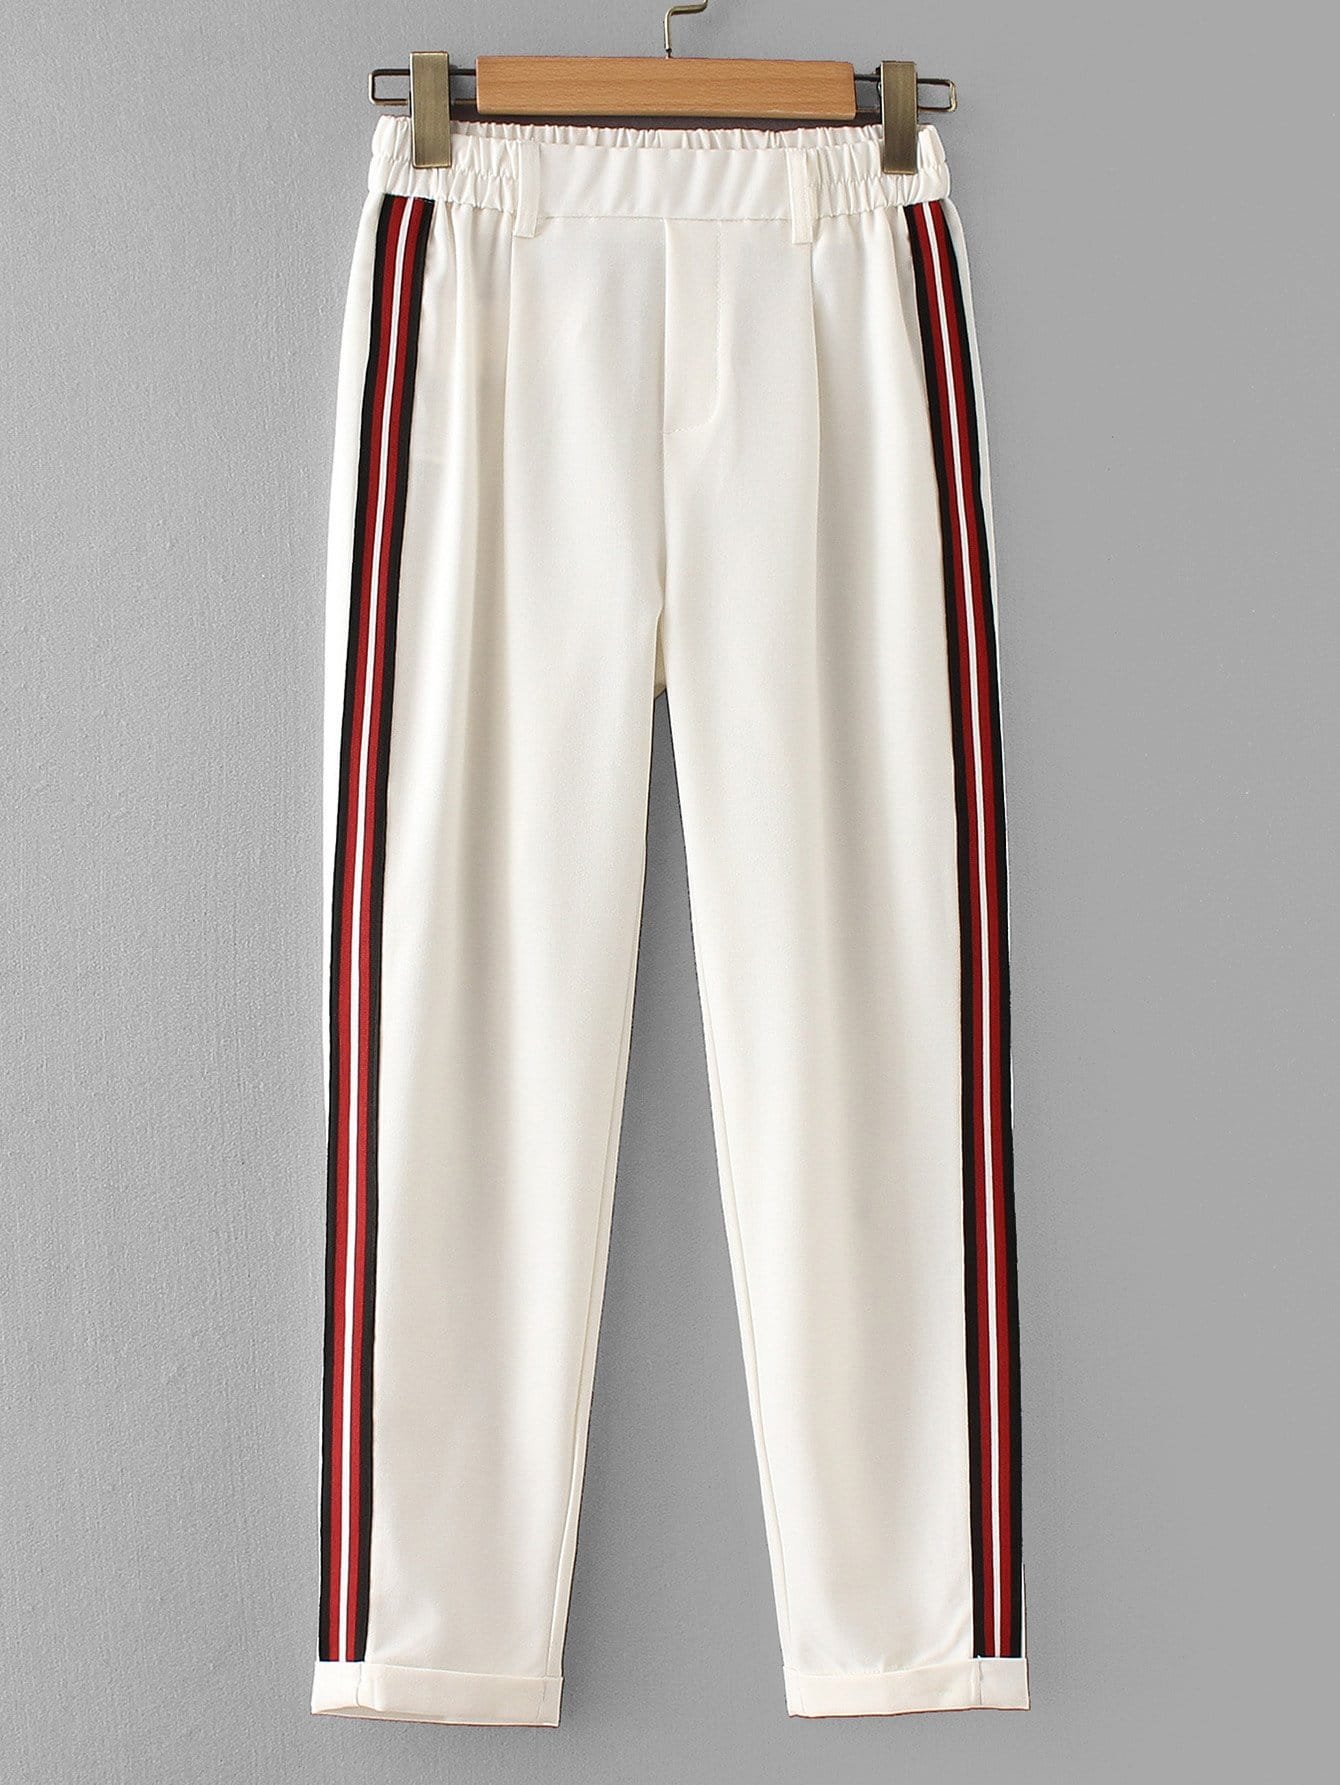 Striped Tape Side Cuffed Pants solid cuffed pants